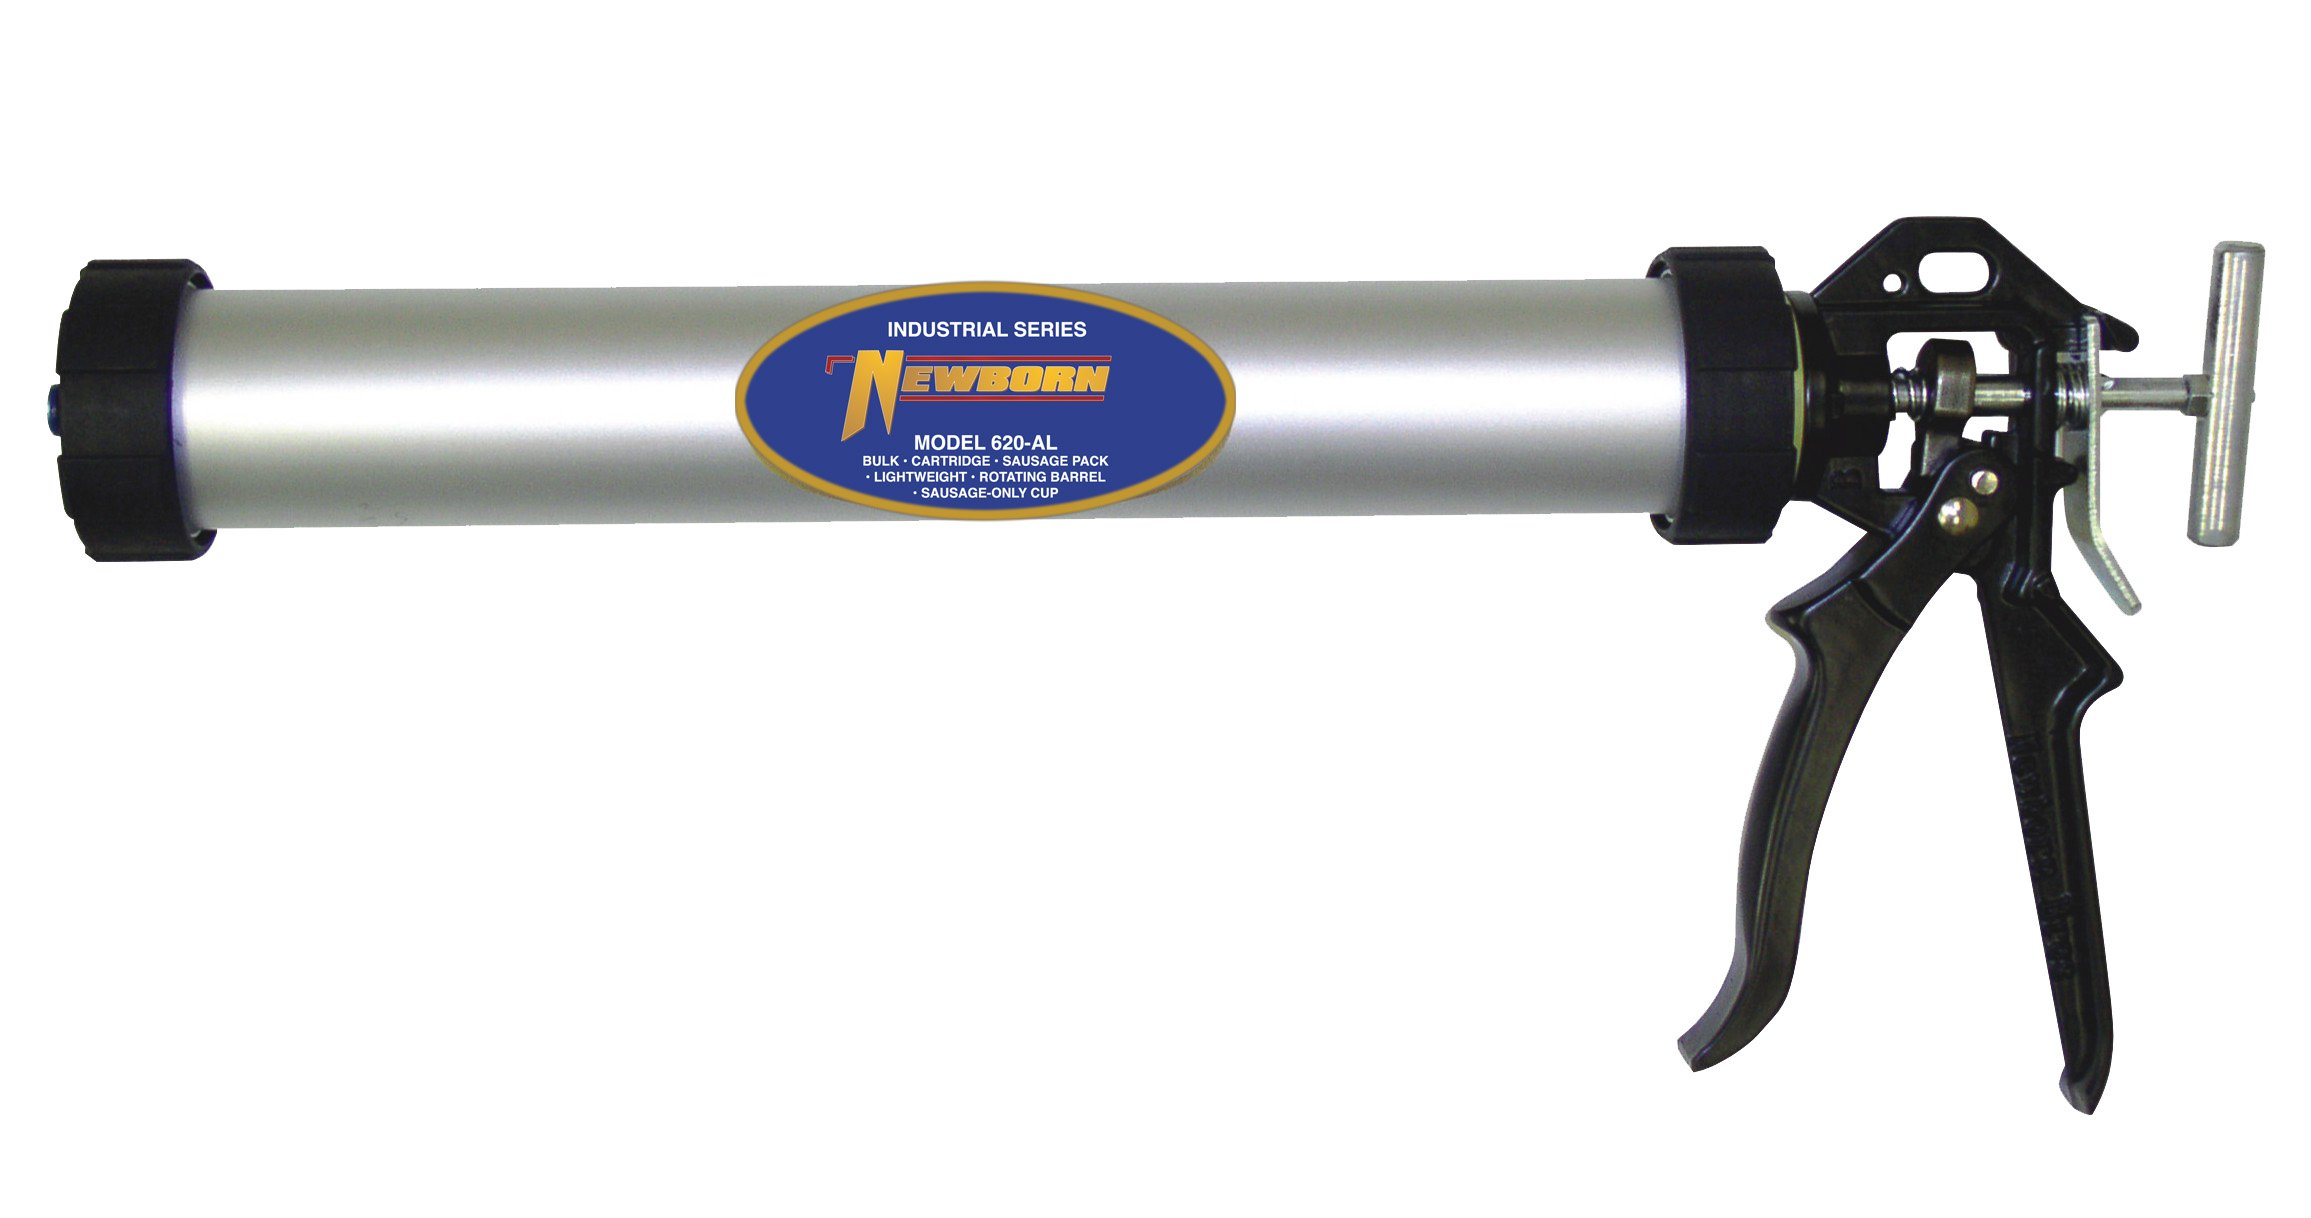 Newborn 634-AL Sausage/Bulk/Cartridge Smooth Rod Caulking Gun, 10-30 oz. Sausage Packs/34 oz. Bulk, 18:1 Thrust Ratio